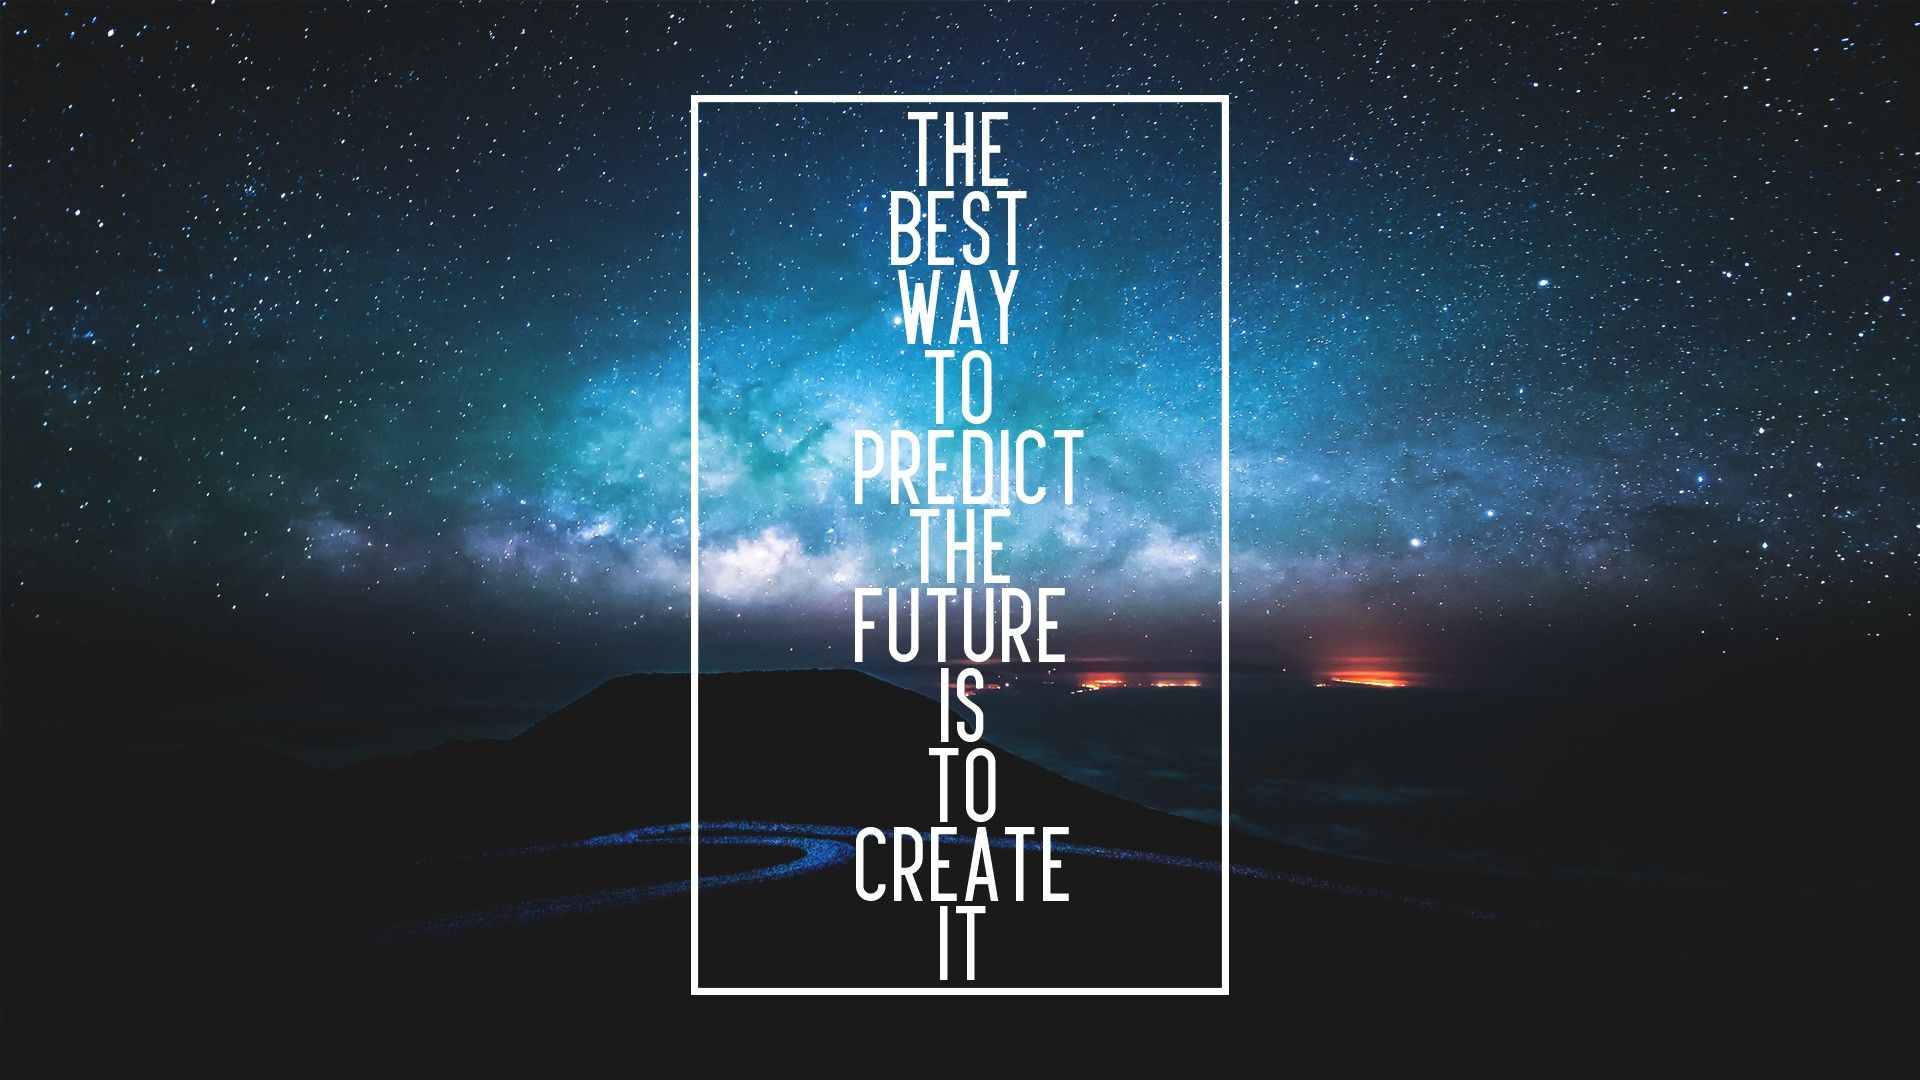 Creative Motivational Quote Wallpaper Motivational Quotes Wallpaper Hd Quotes Wallpaper Quotes